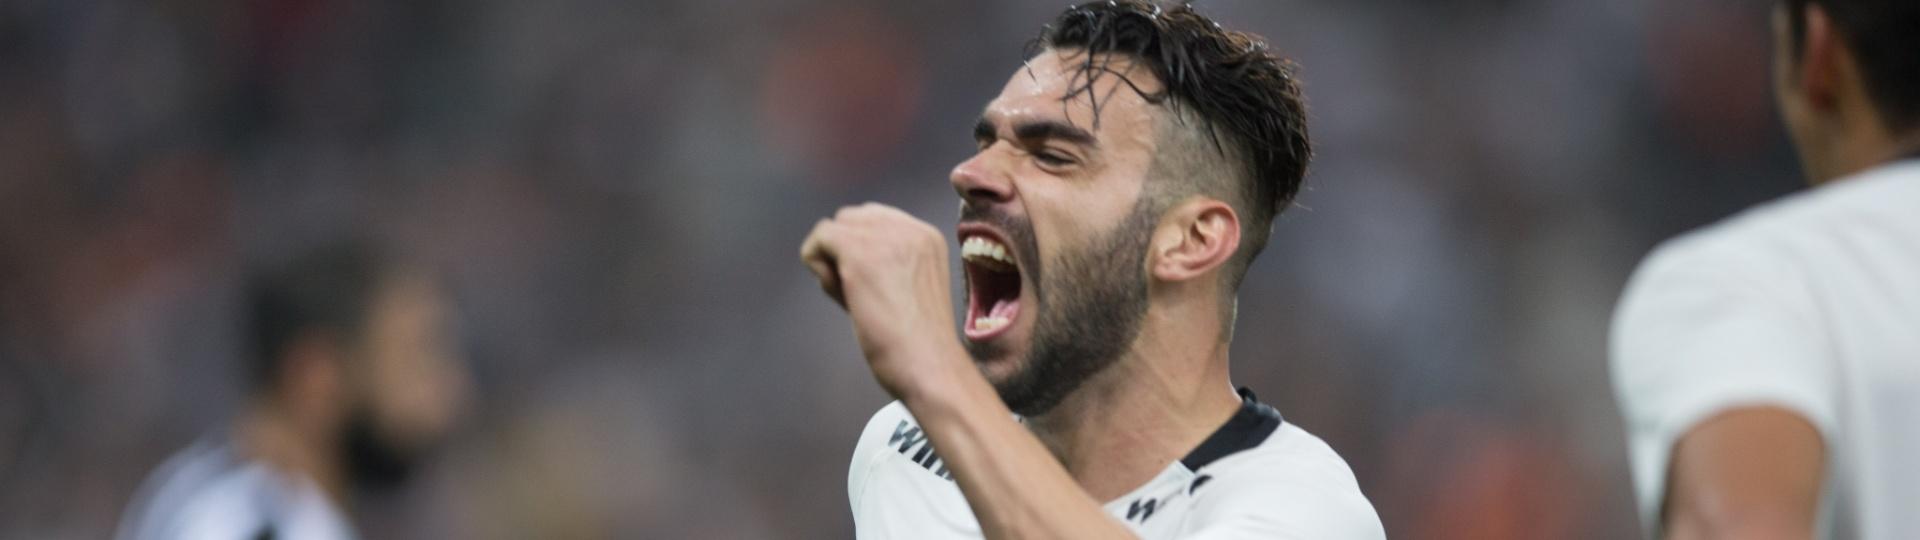 Bruno Henrique comemora gol marcado pelo Corinthians sobre o Botafogo